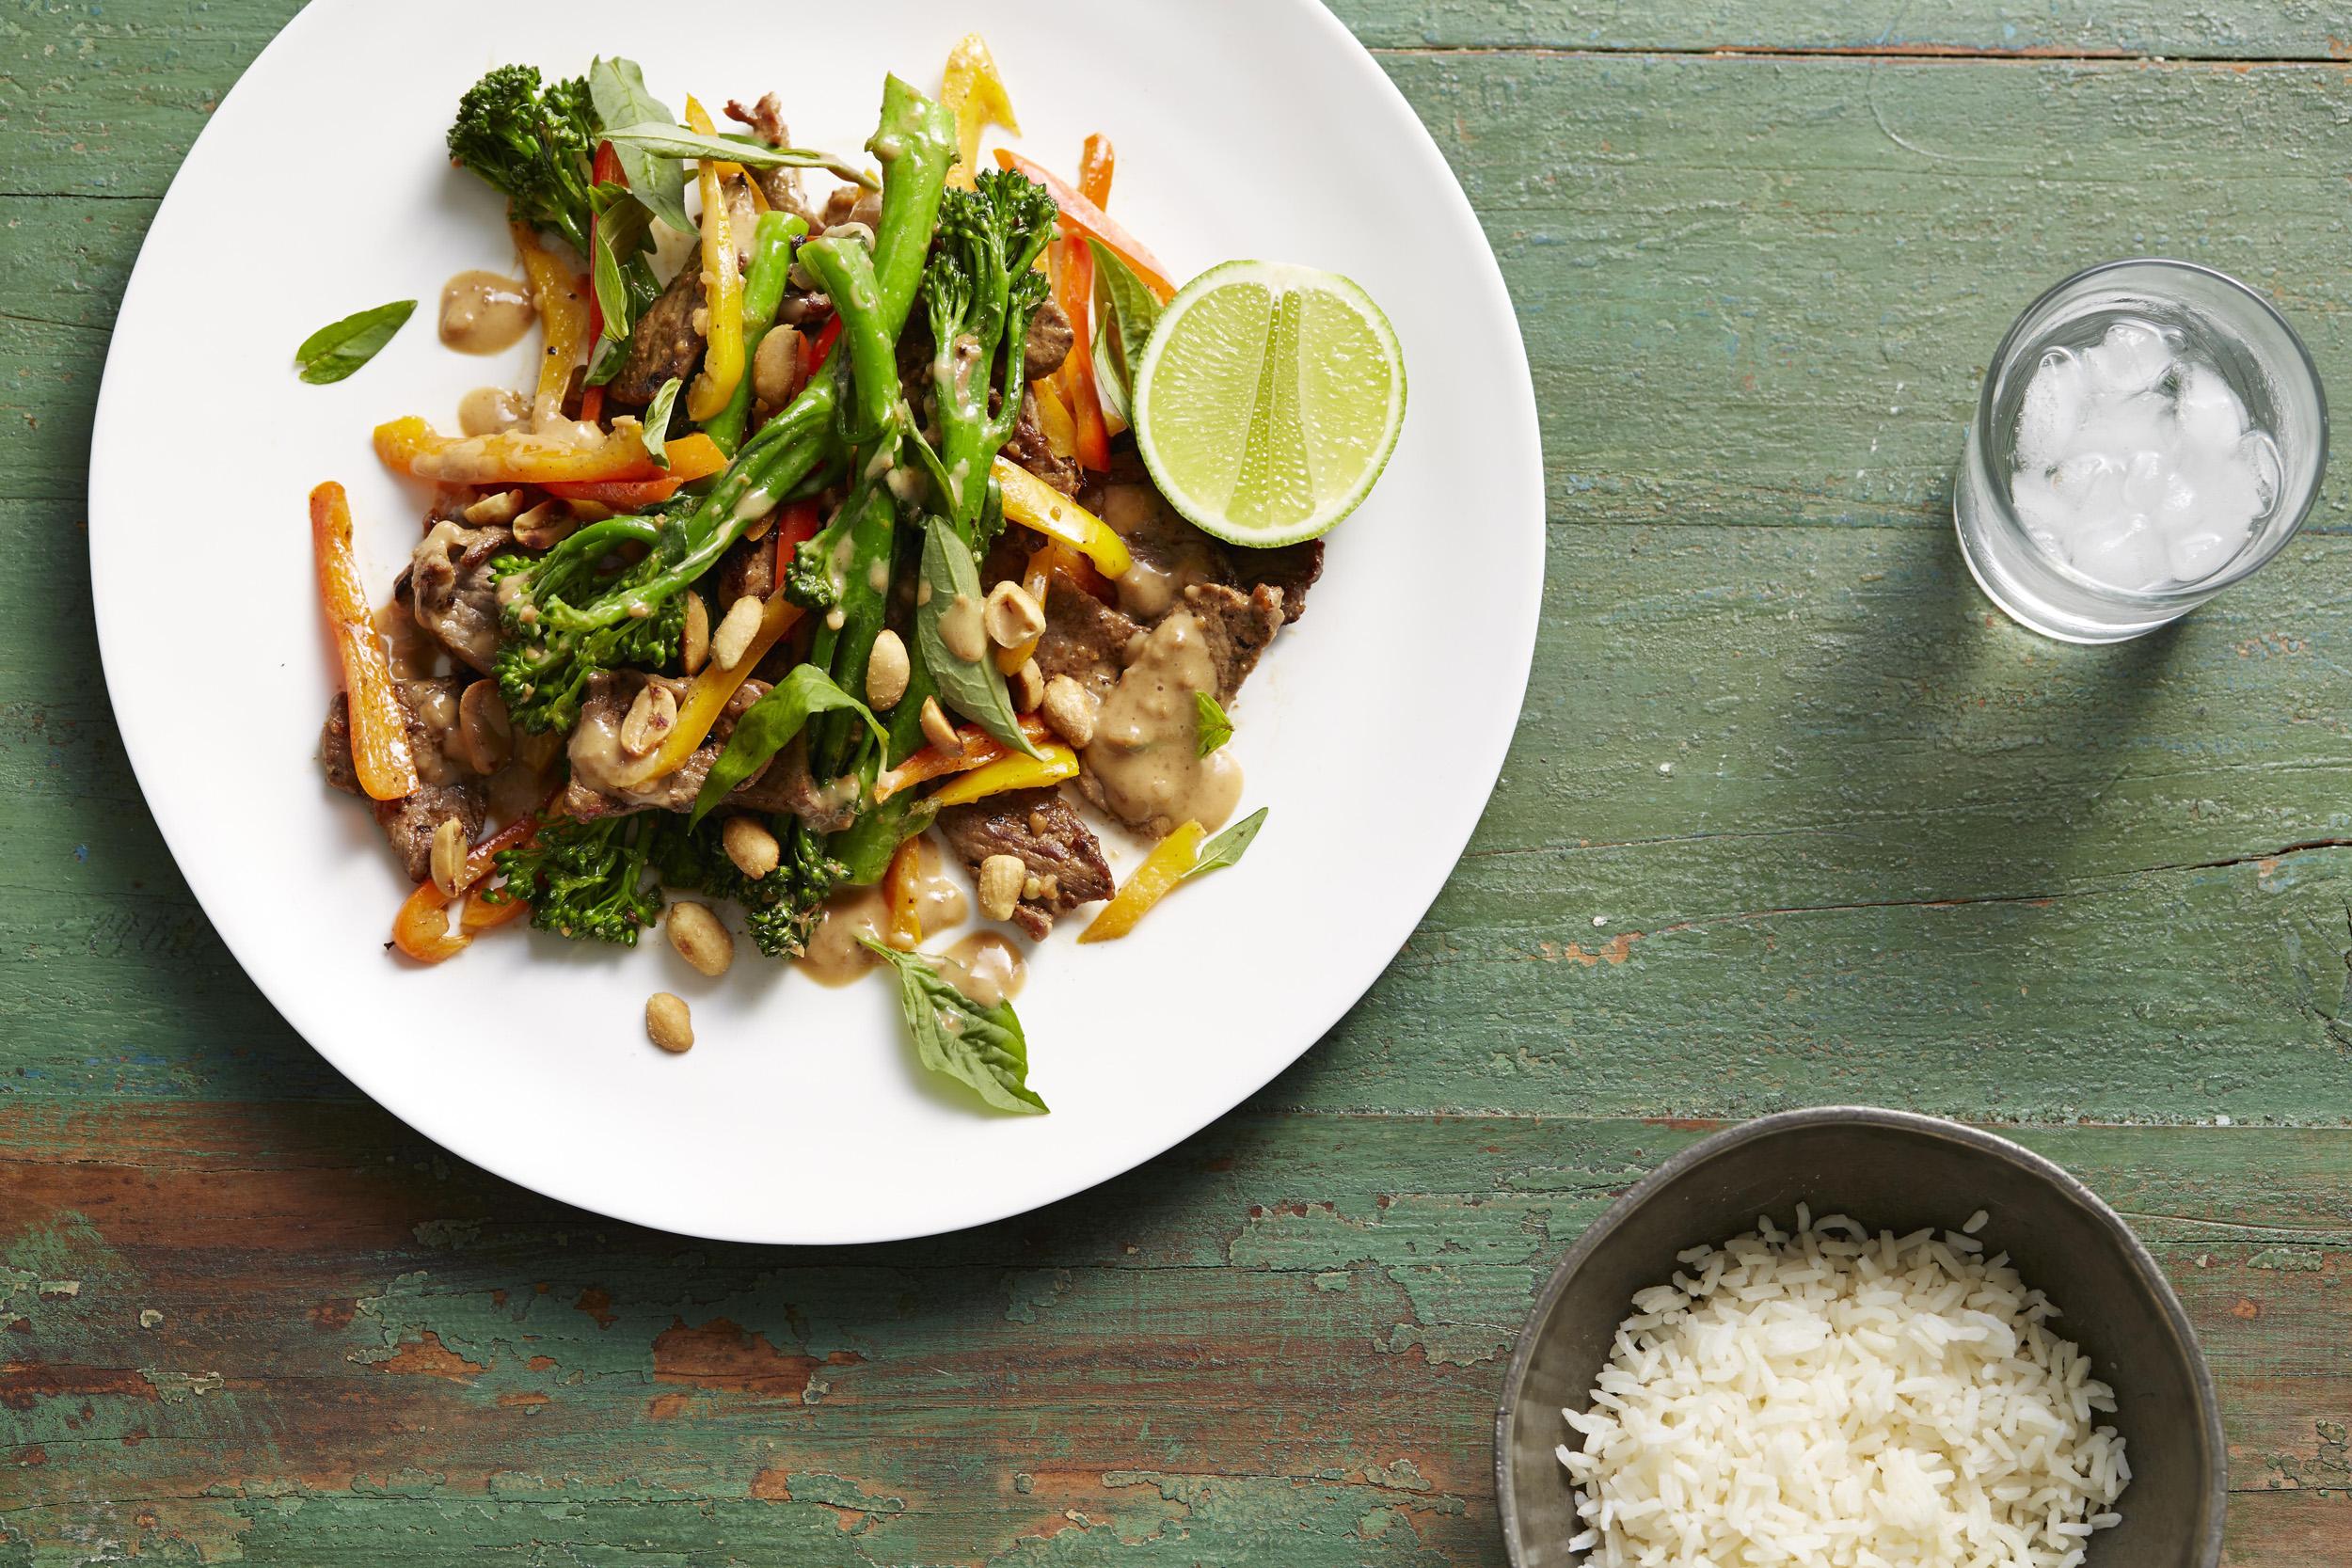 Recipe - Satay Beef and Broccolini Stir-fry